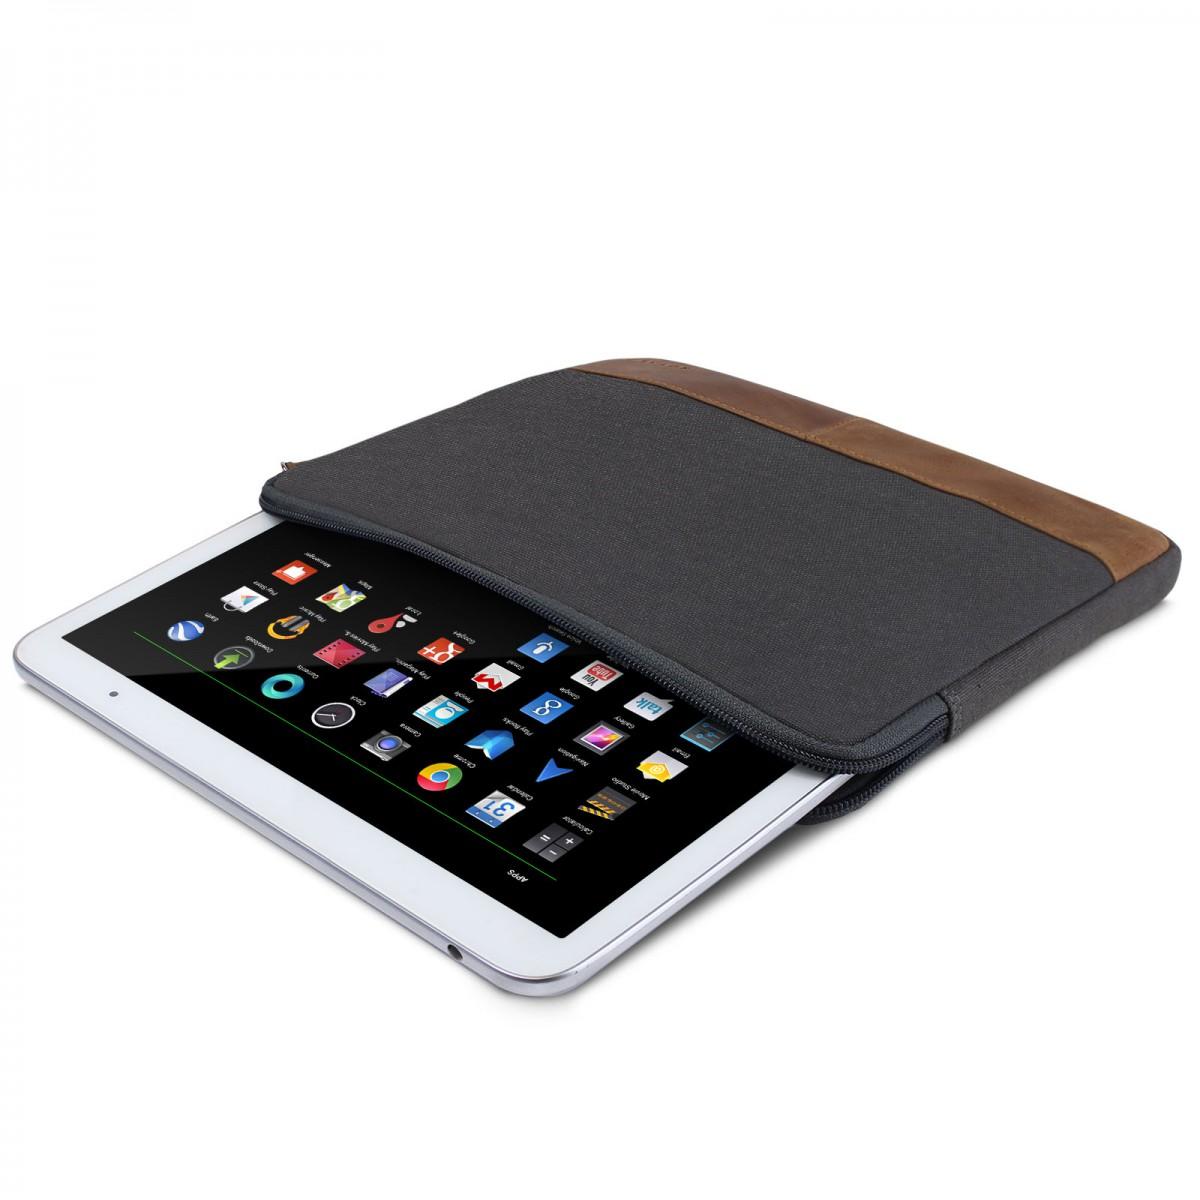 Excellent Royalz Universal Canvas Tasche Fur Tablets 8 9 Zoll 10 Zoll Tablets Bis Max 24Cm X 17Cm X 1 5Cm Design Tablet Sleeve Hulle Aus Canvas Grau Download Free Architecture Designs Itiscsunscenecom